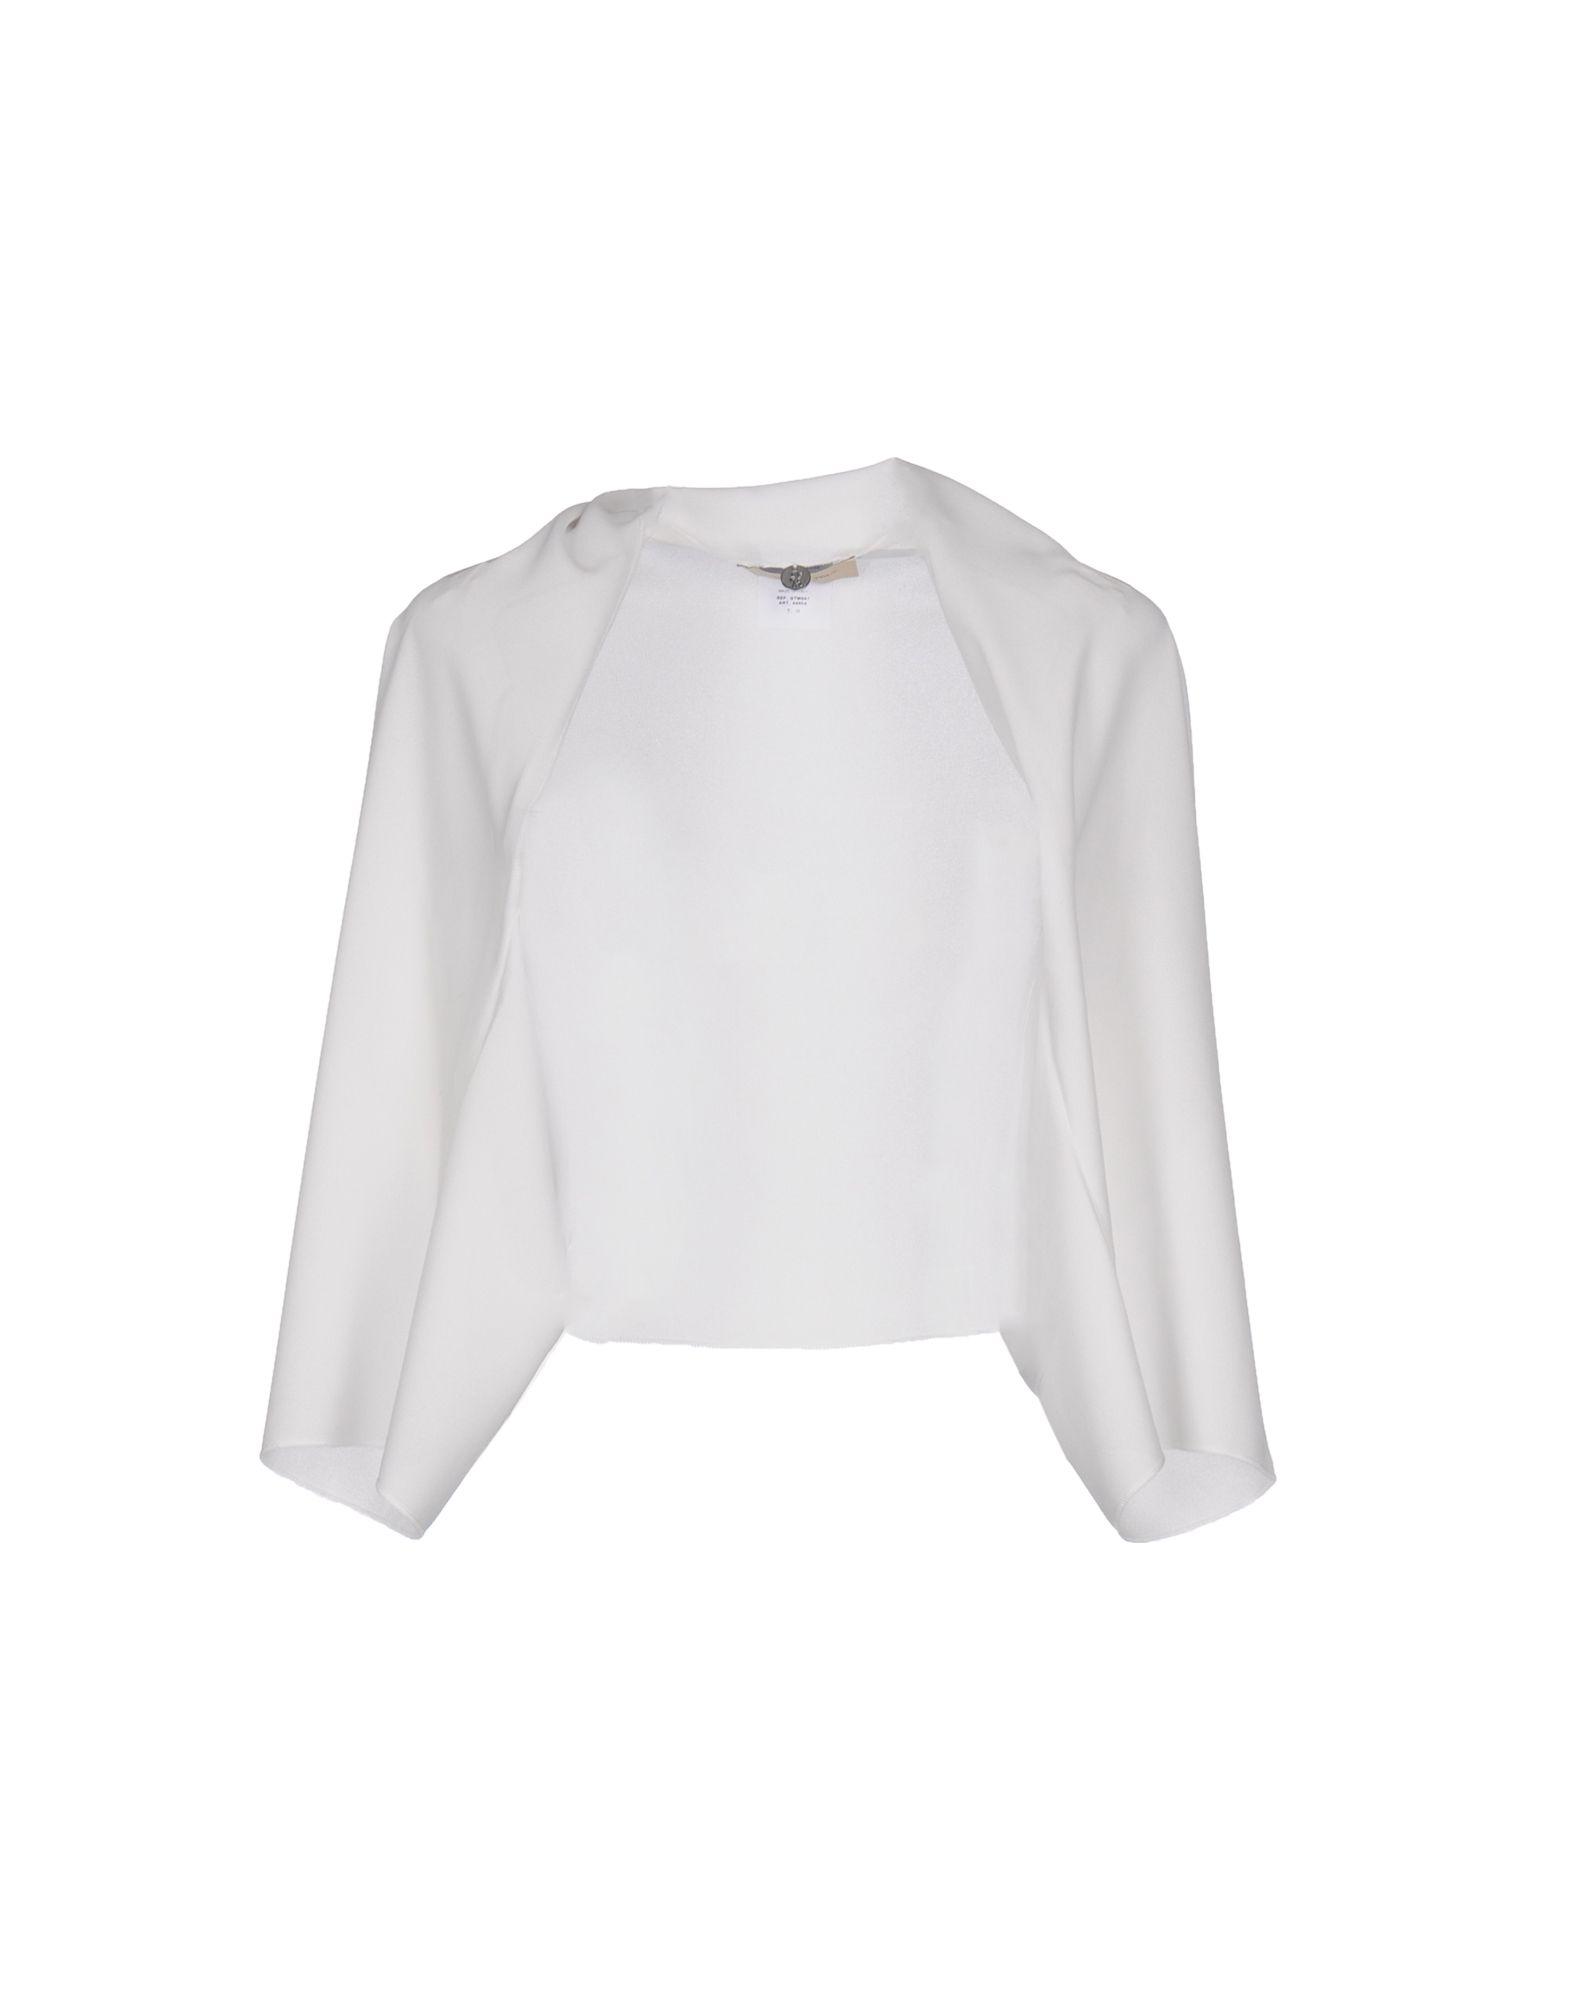 JUST FOR YOU Damen Bolero Farbe Weiß Größe 1